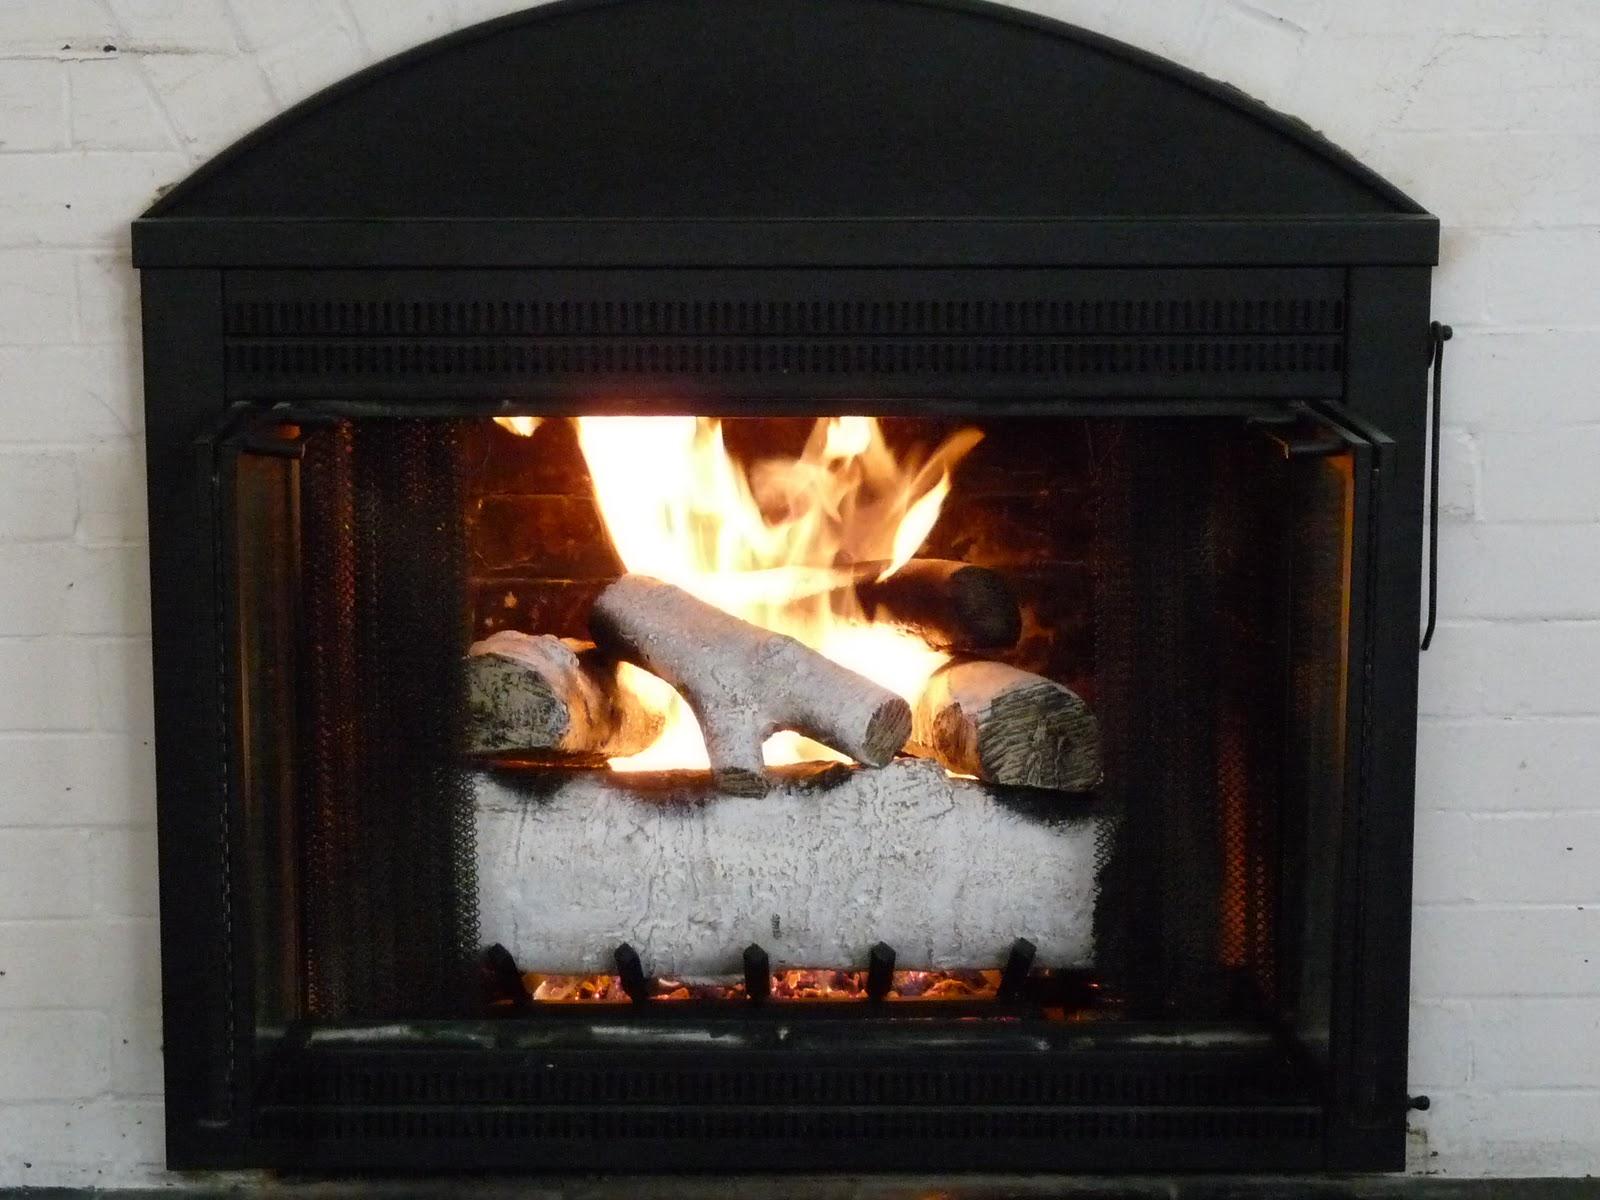 100 Small Propane FireplaceOutdoor Gas Fireplace Kits Nz